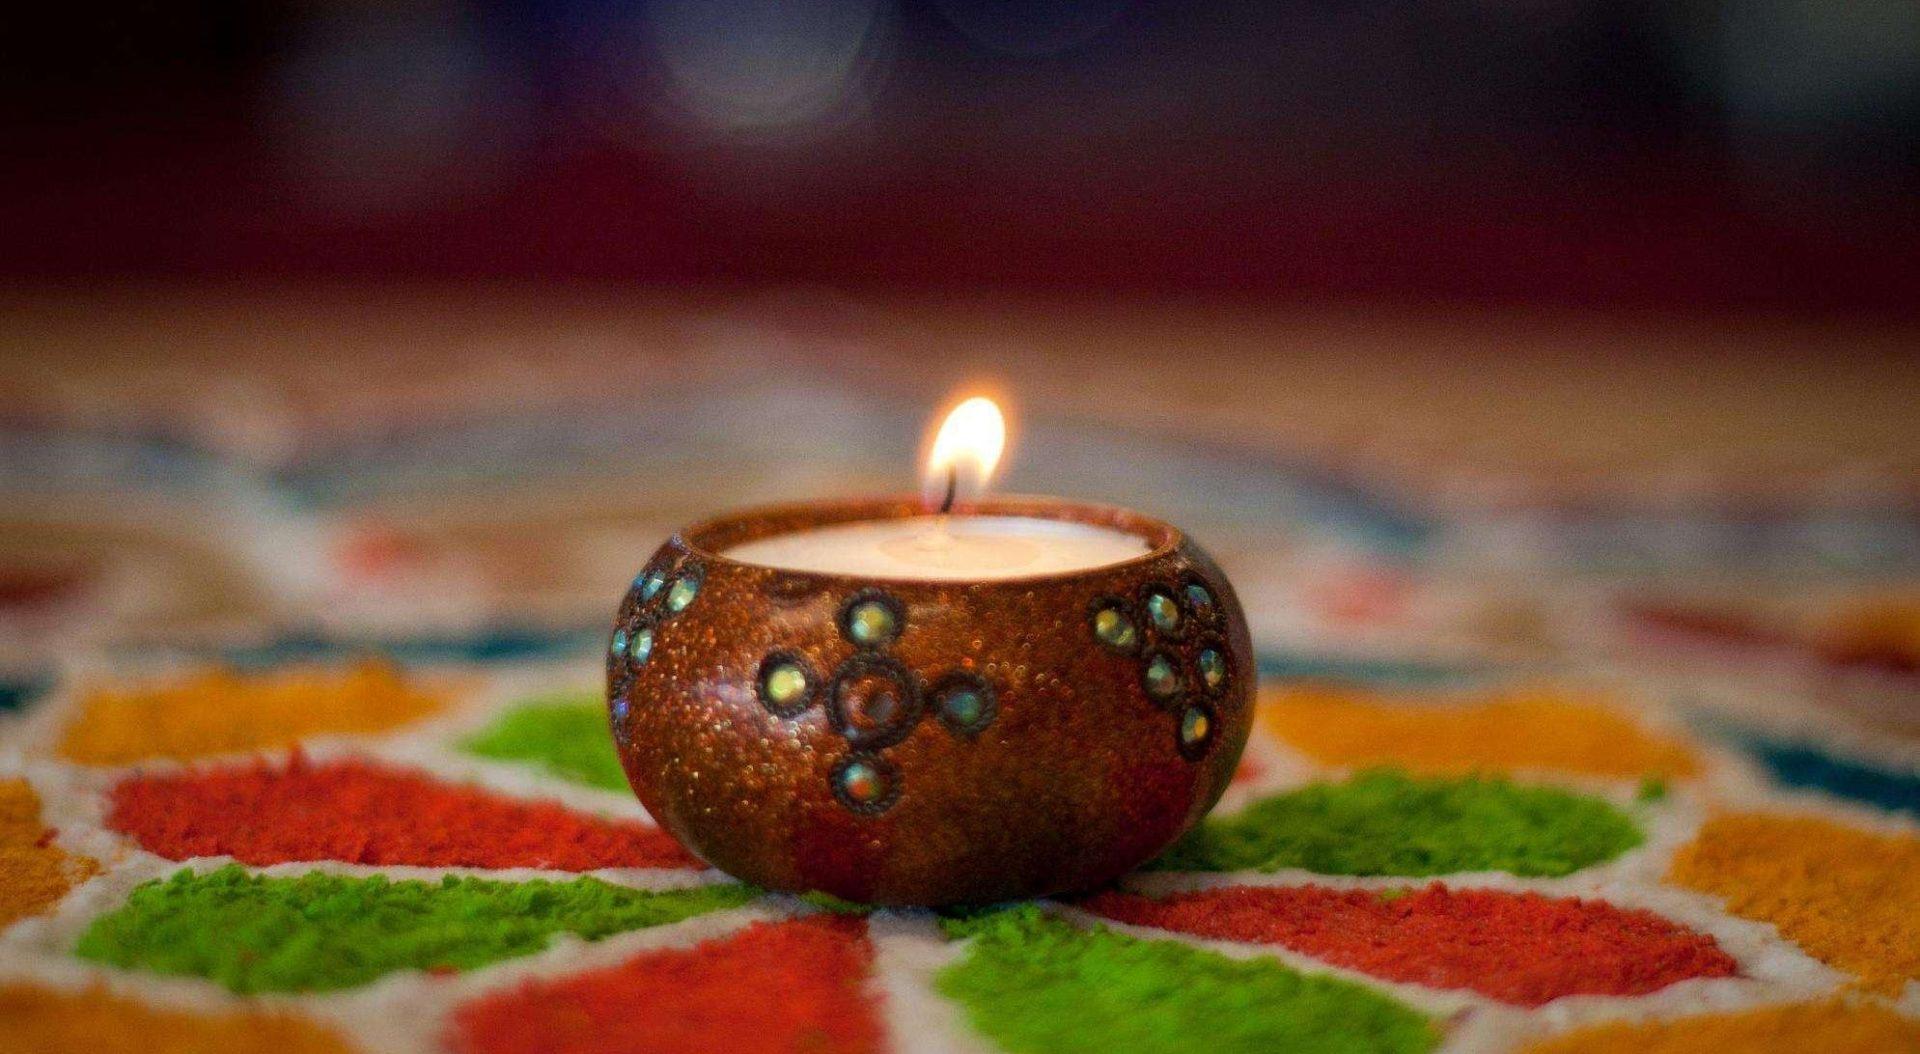 Happy Diwali Wallpaper 3d 2015 Diwali Festival Of Lights Is October 30 World Religion News